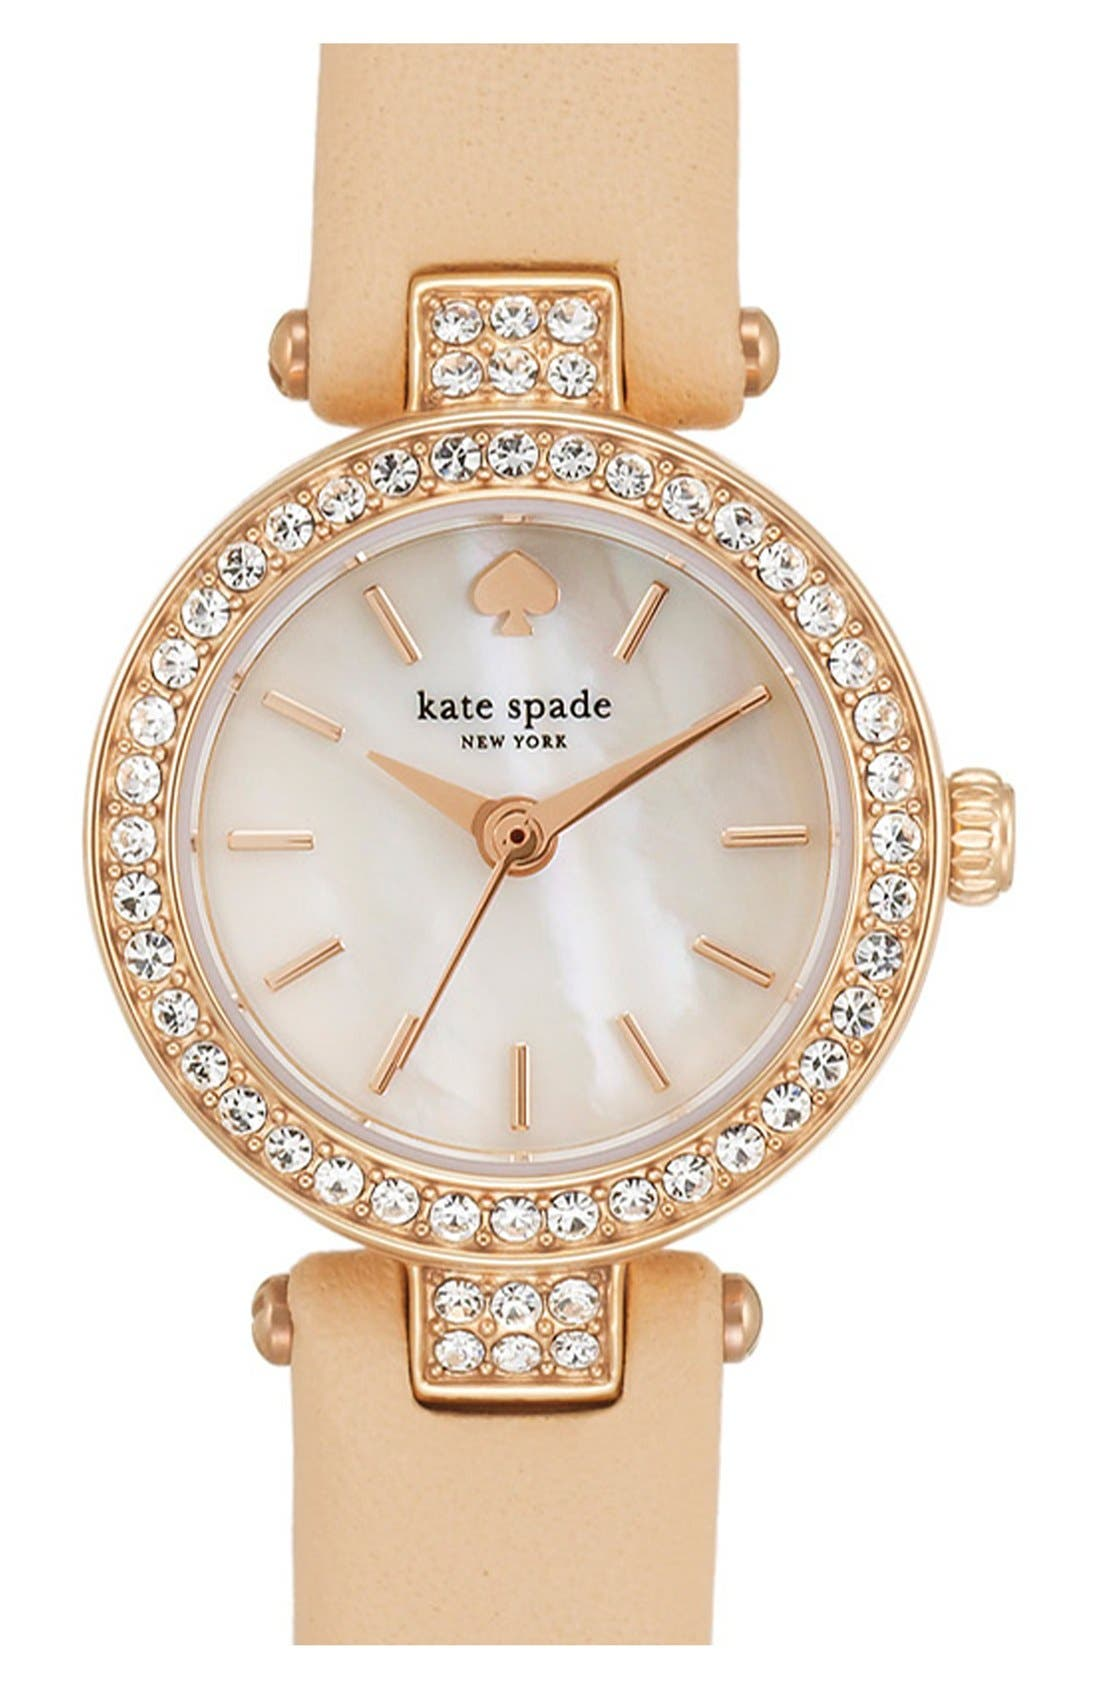 Main Image - kate spade new york 'tiny metro' crystal bezel leather strap watch, 20mm